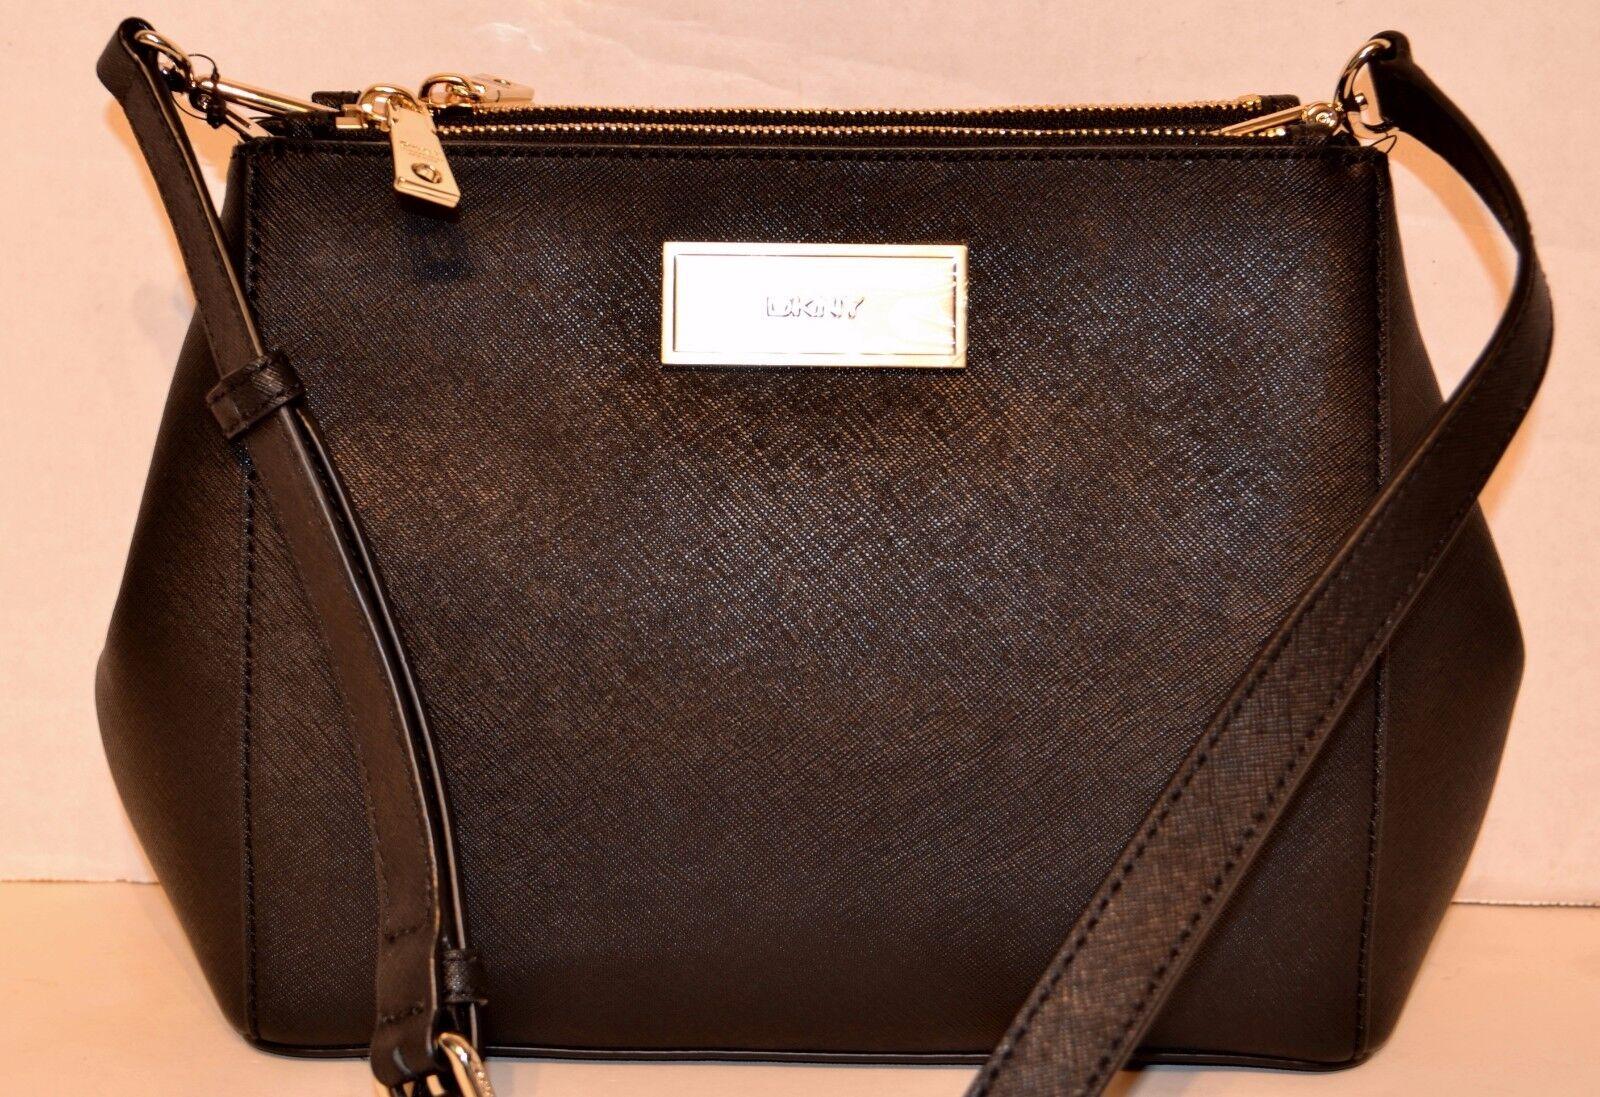 DKNY Pre-owned - Leather Handbag 0IPKCYS0ov